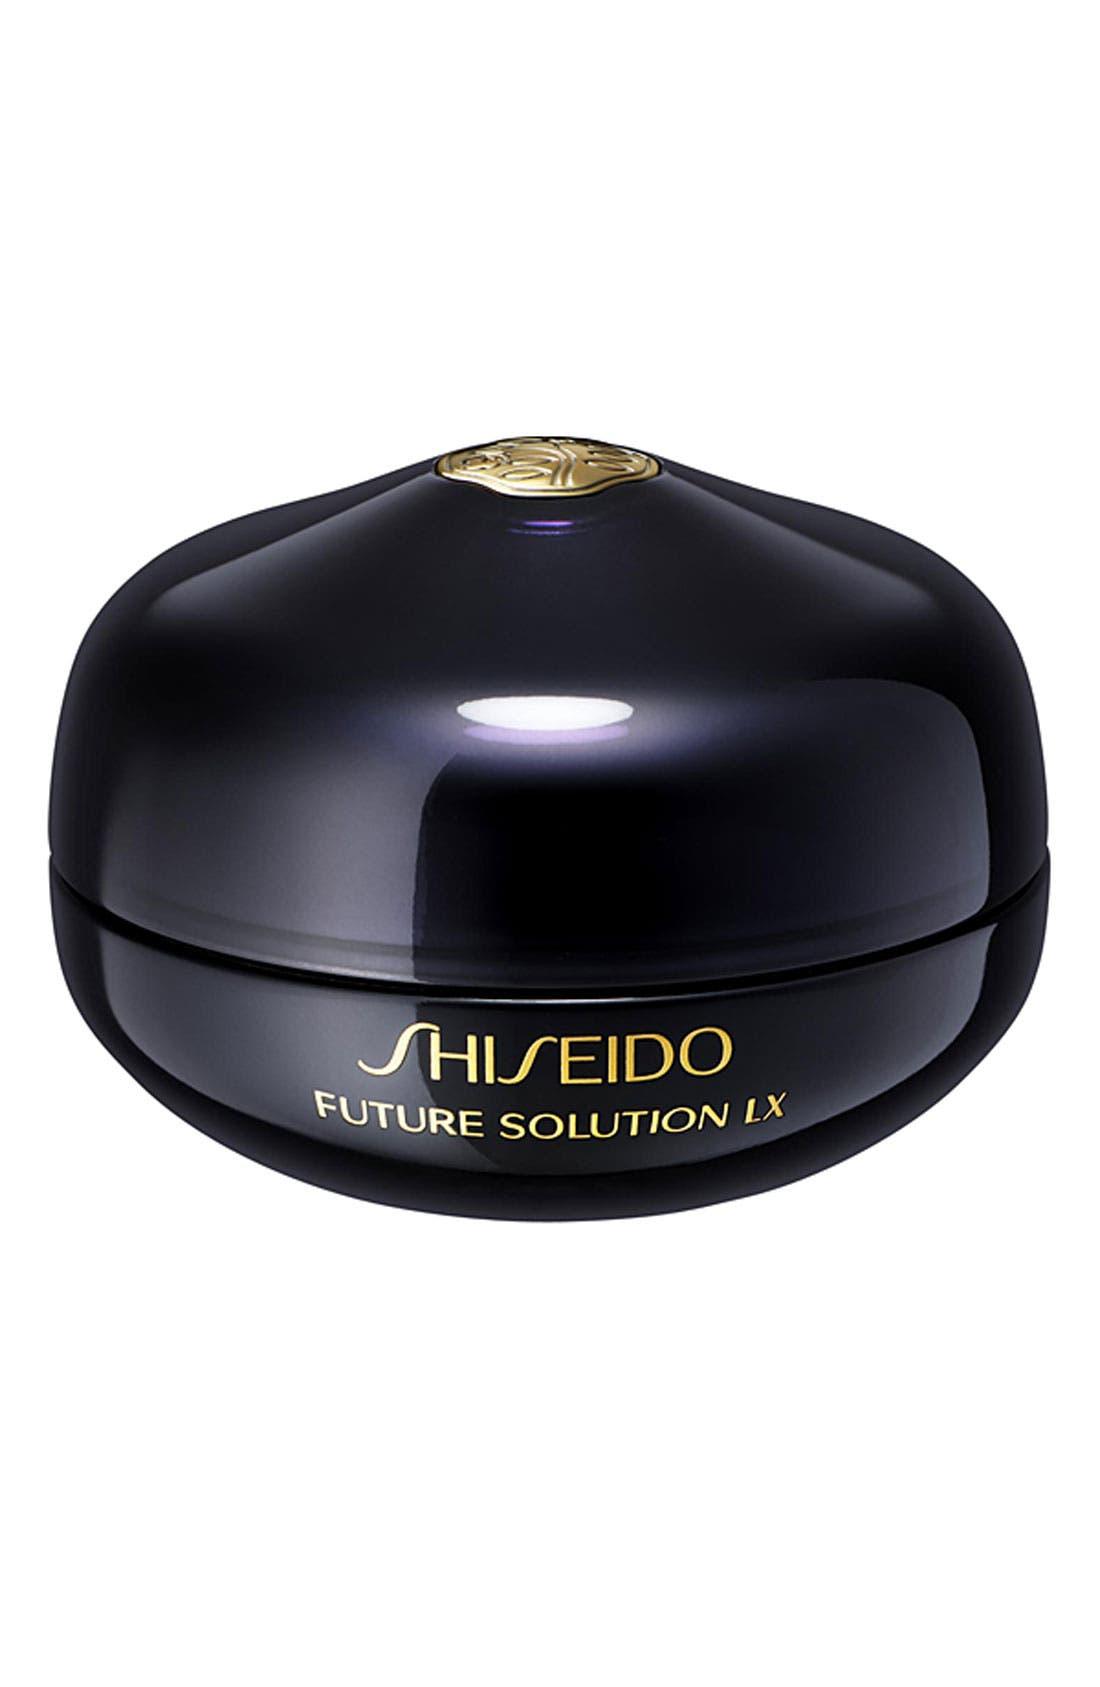 Shiseido 'Future Solution LX' Eye & Lip Contour Regenerating Cream